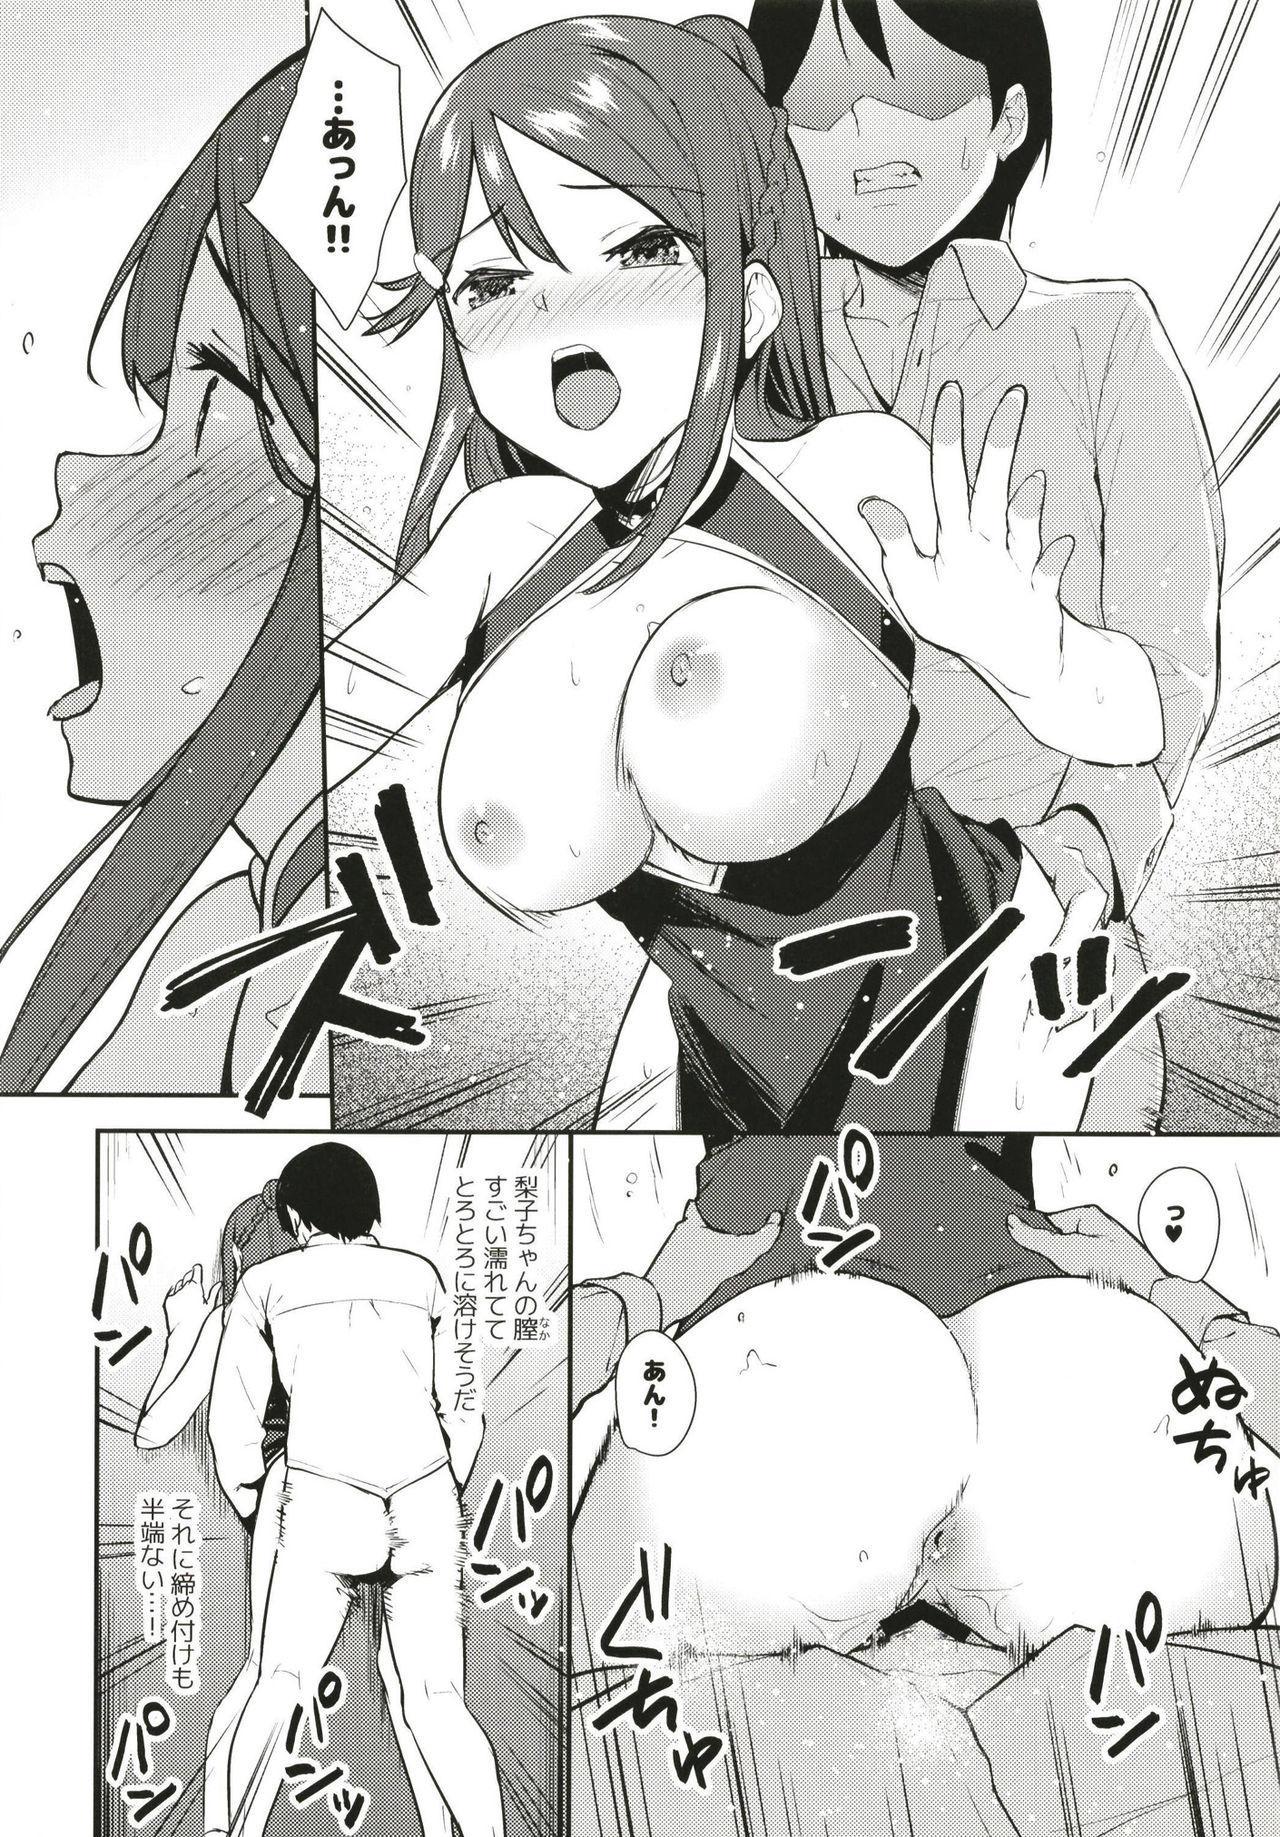 Kyou kara Hajimaru Sex Life Fortissimo - Start in my brand new SEX life. 17